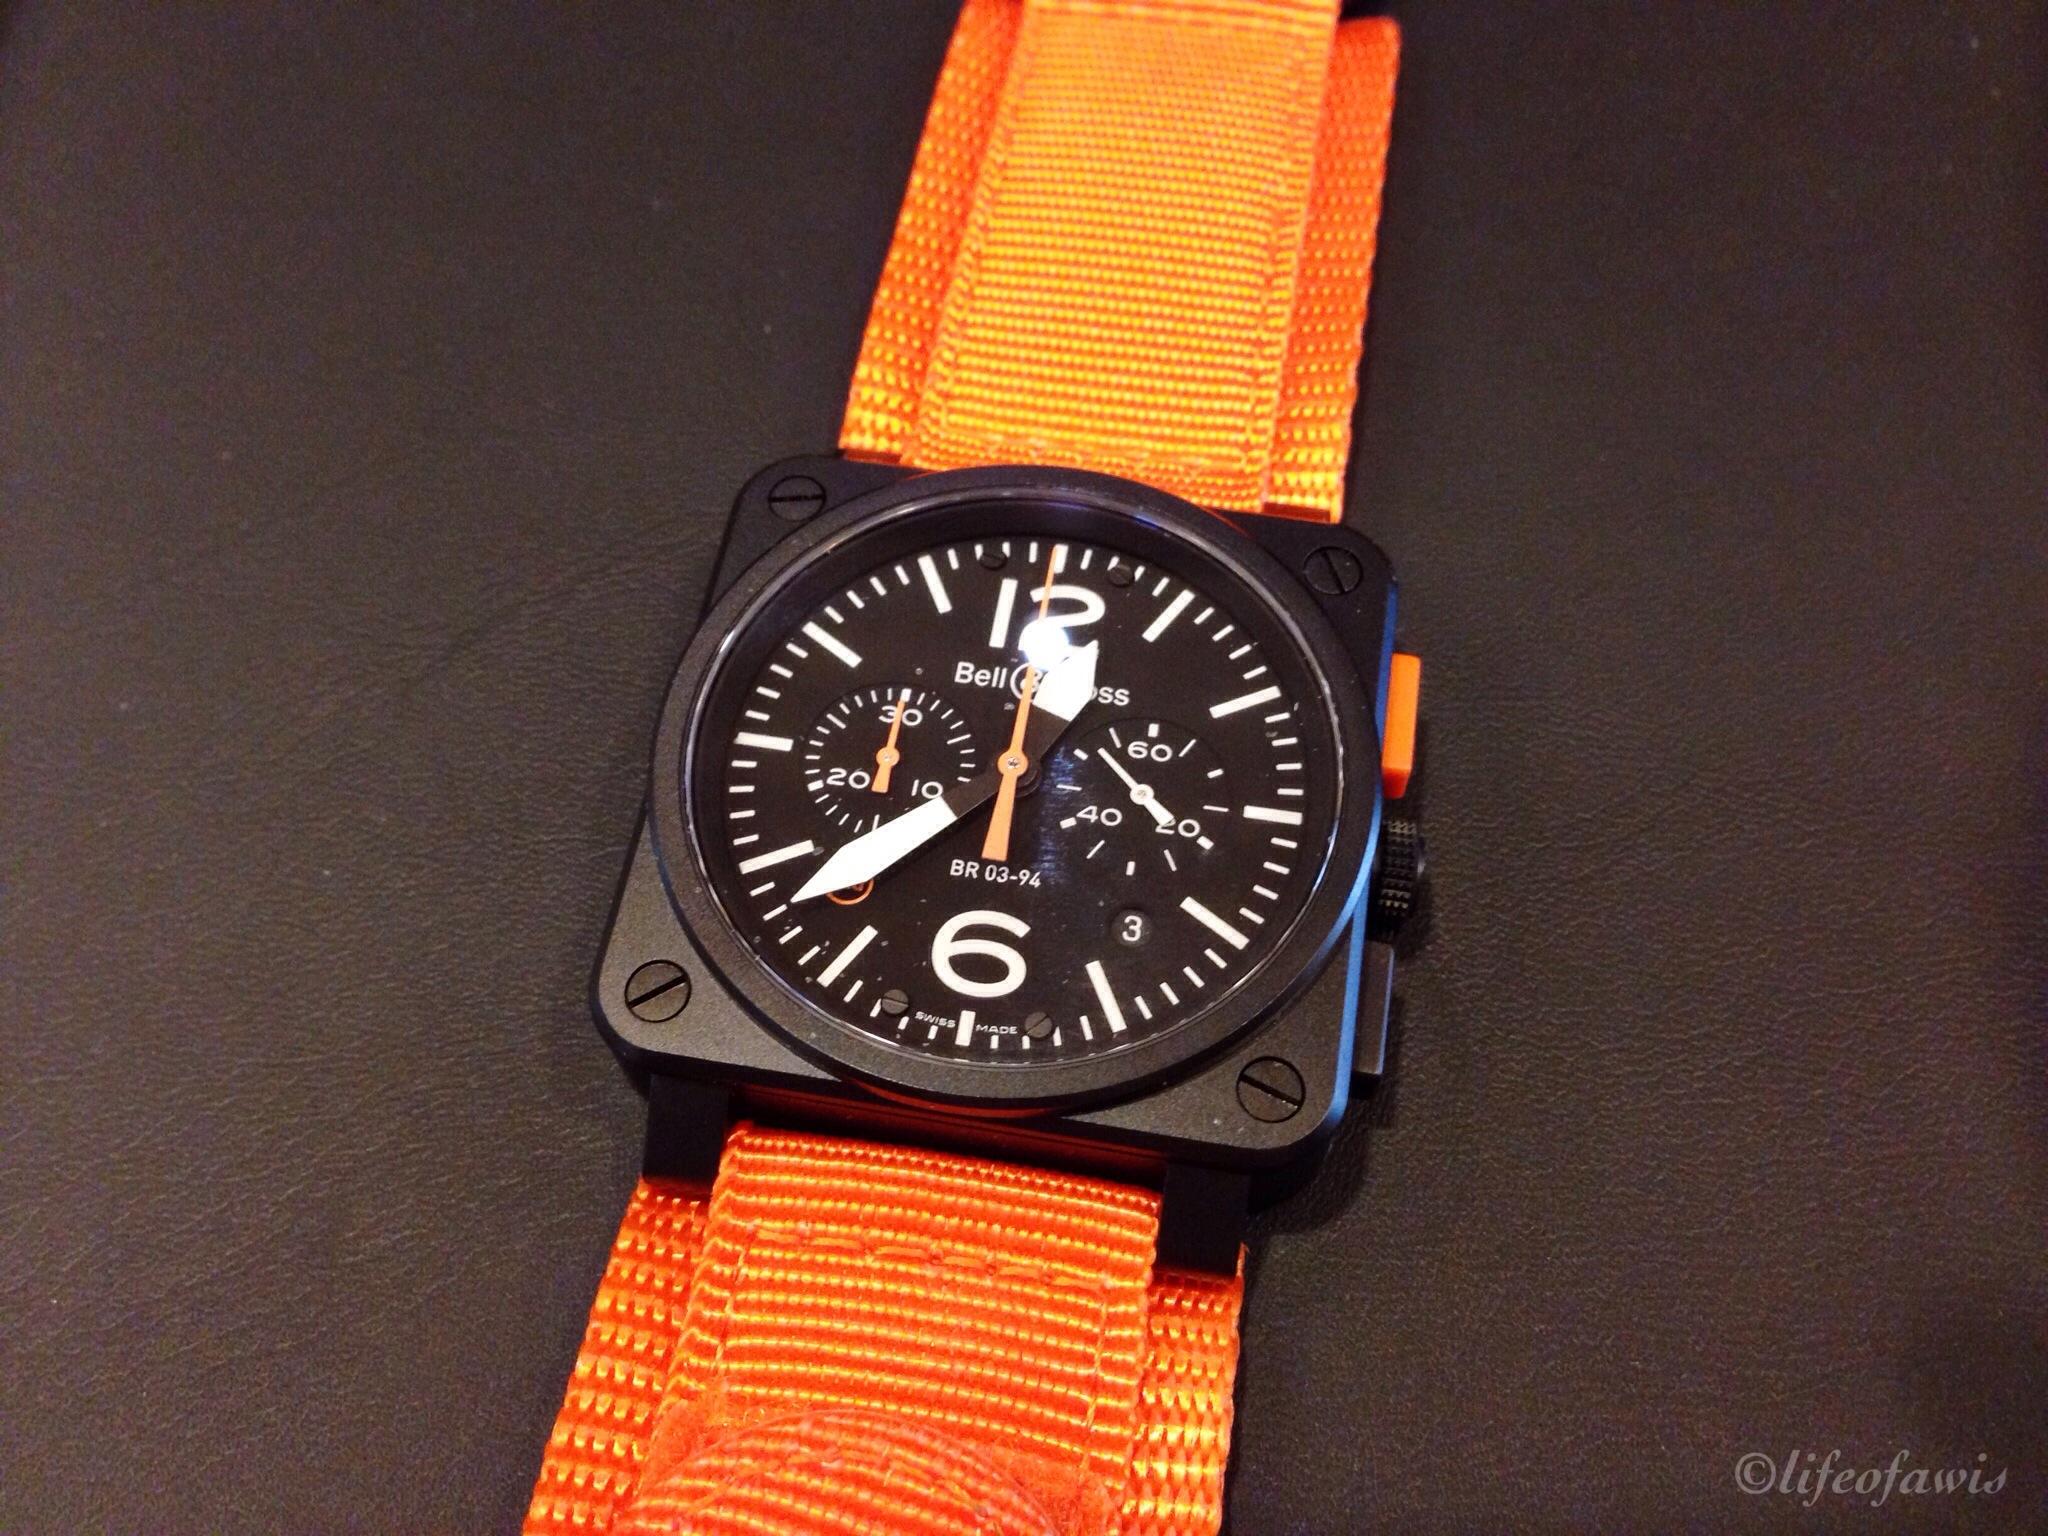 BR-03-94 Carbon Orange.